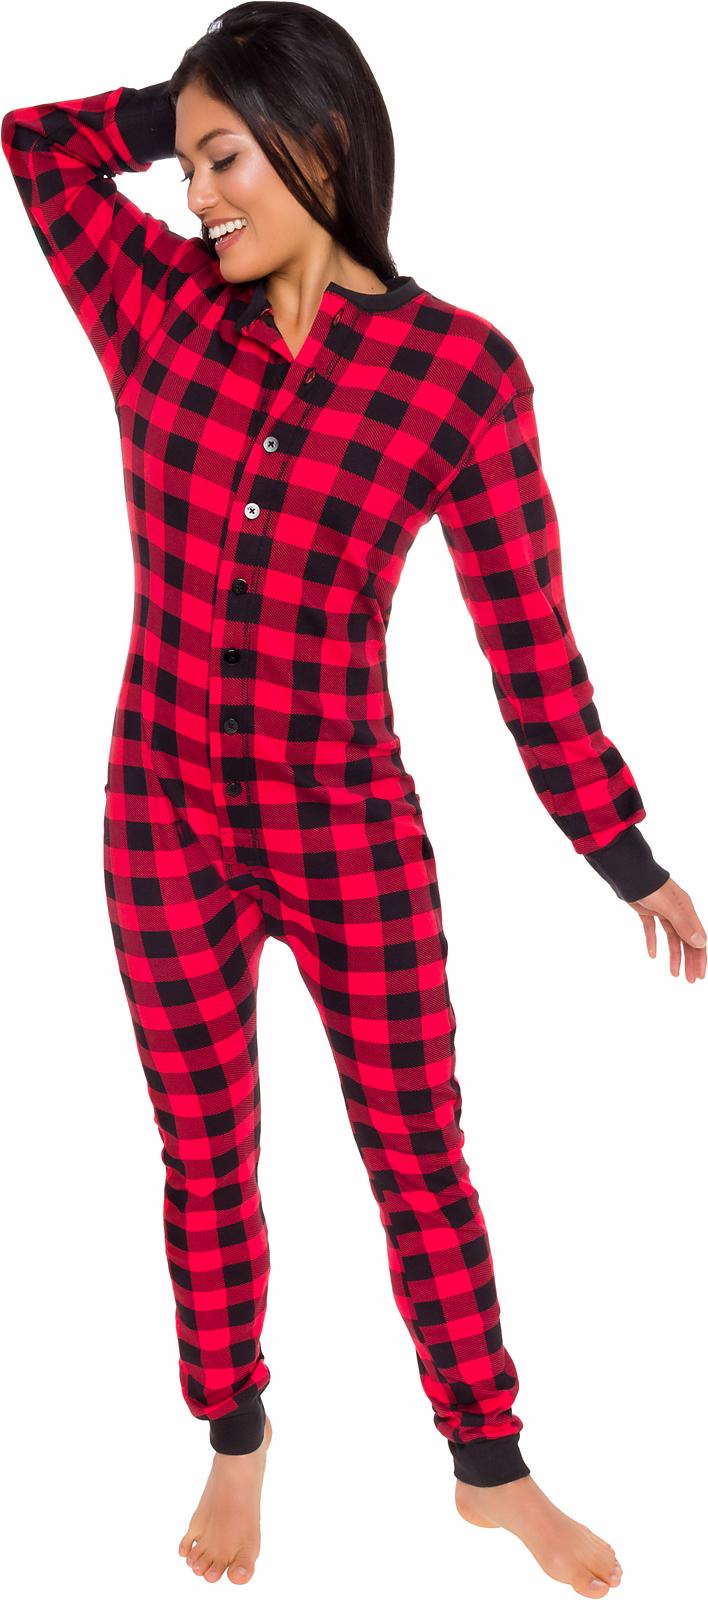 Silver Lilly Unisex Adult Plaid One Piece Pajamas w/ Drop Seat (Black/White, L)   eBay